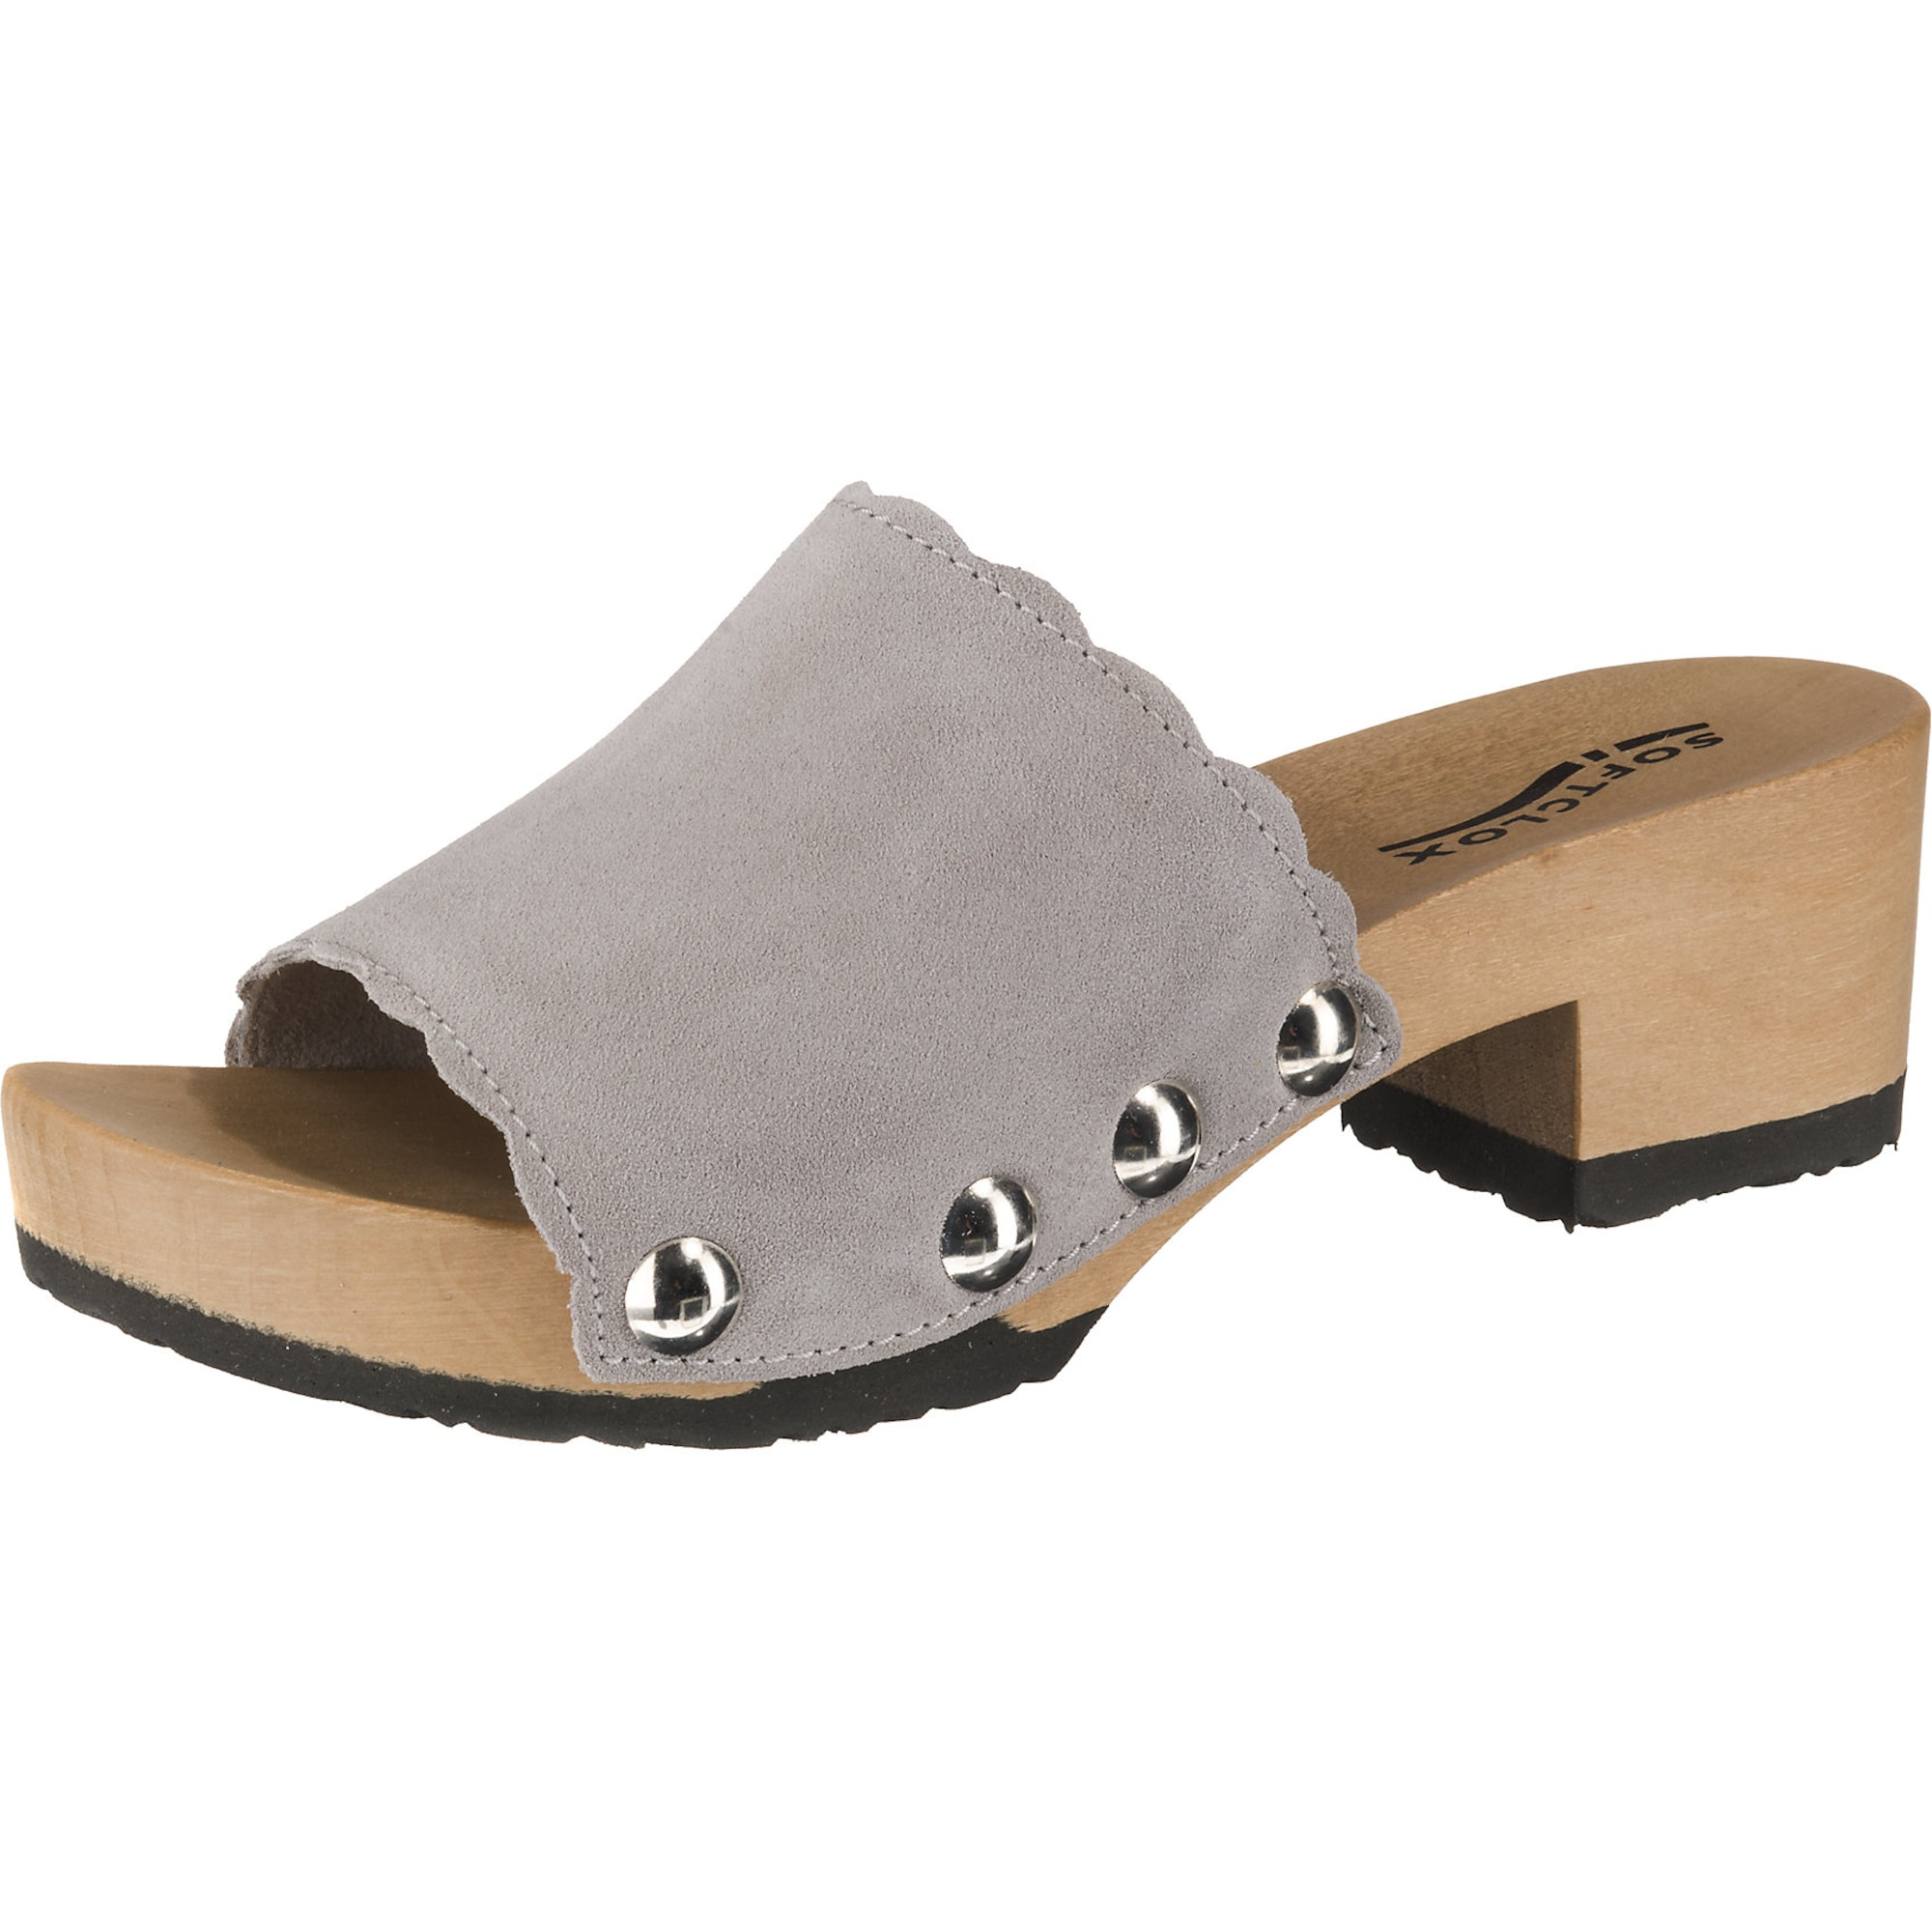 Clogs 'Pabla' | Schuhe > Clogs & Pantoletten > Clogs | Grau | SOFTCLOX